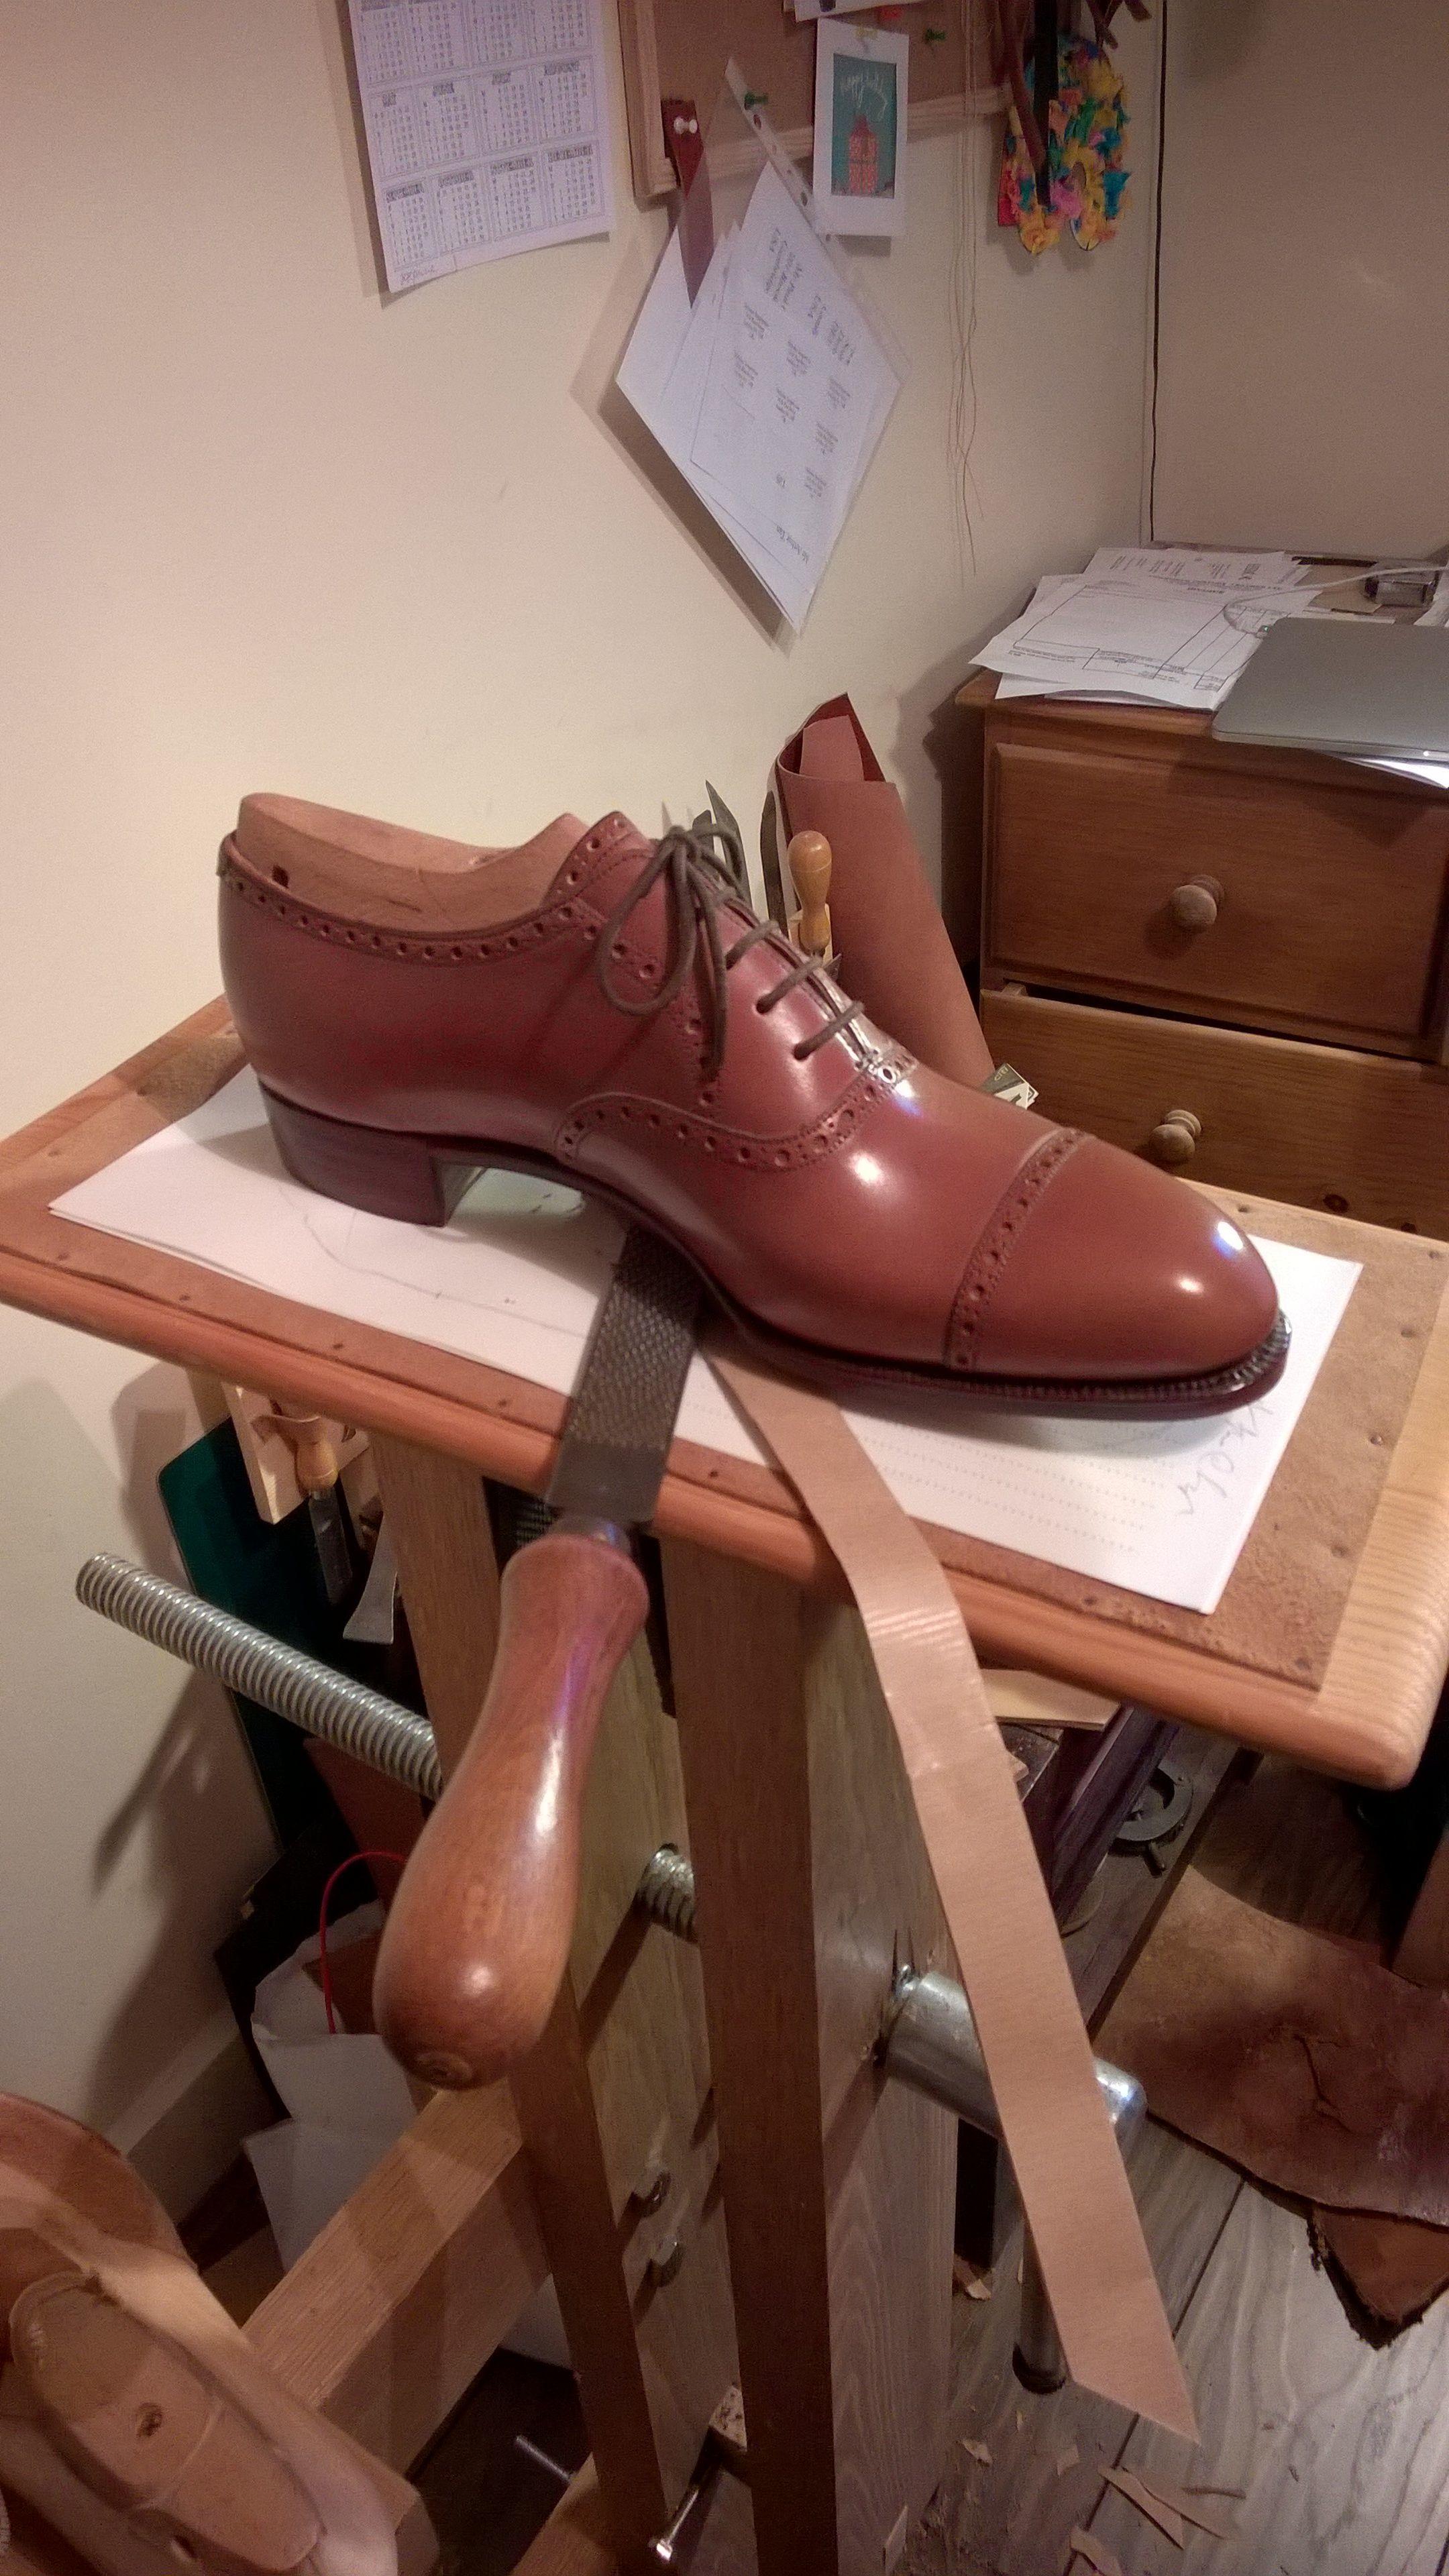 MaChemist's photos in Nicholas Templeman: A Bespoke Shoemaker